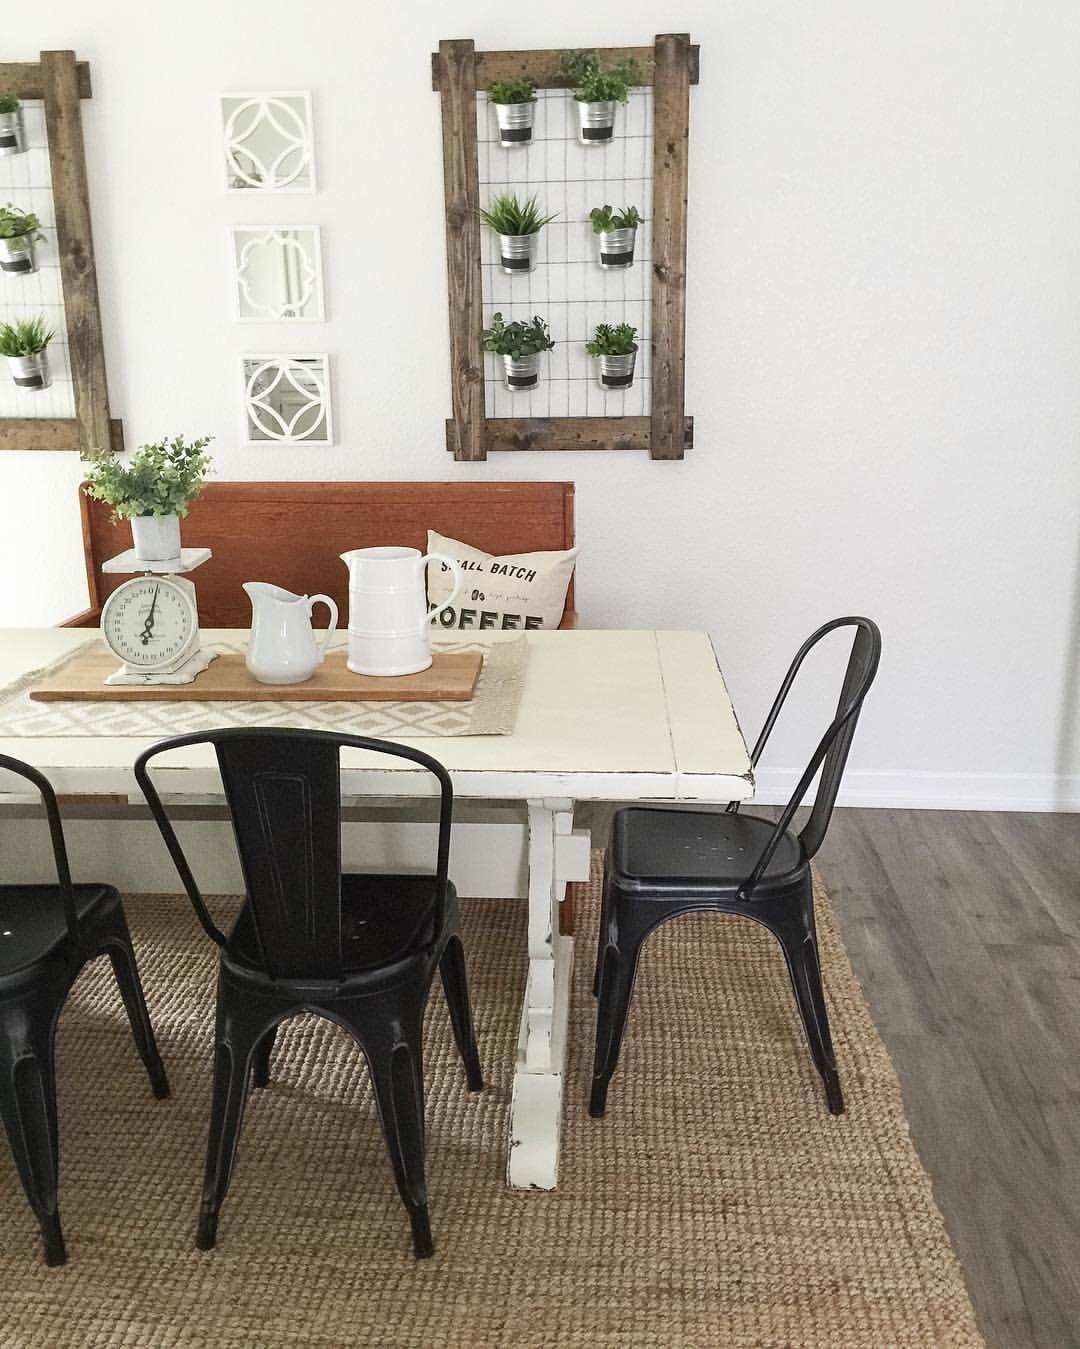 Rug For Kitchen Table Ezr Degreaser White Farmhouse Black Metal Chairs